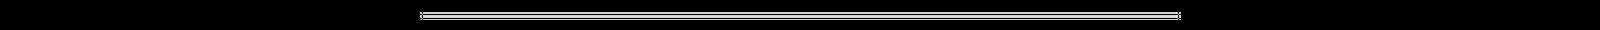 divider-small (1).png